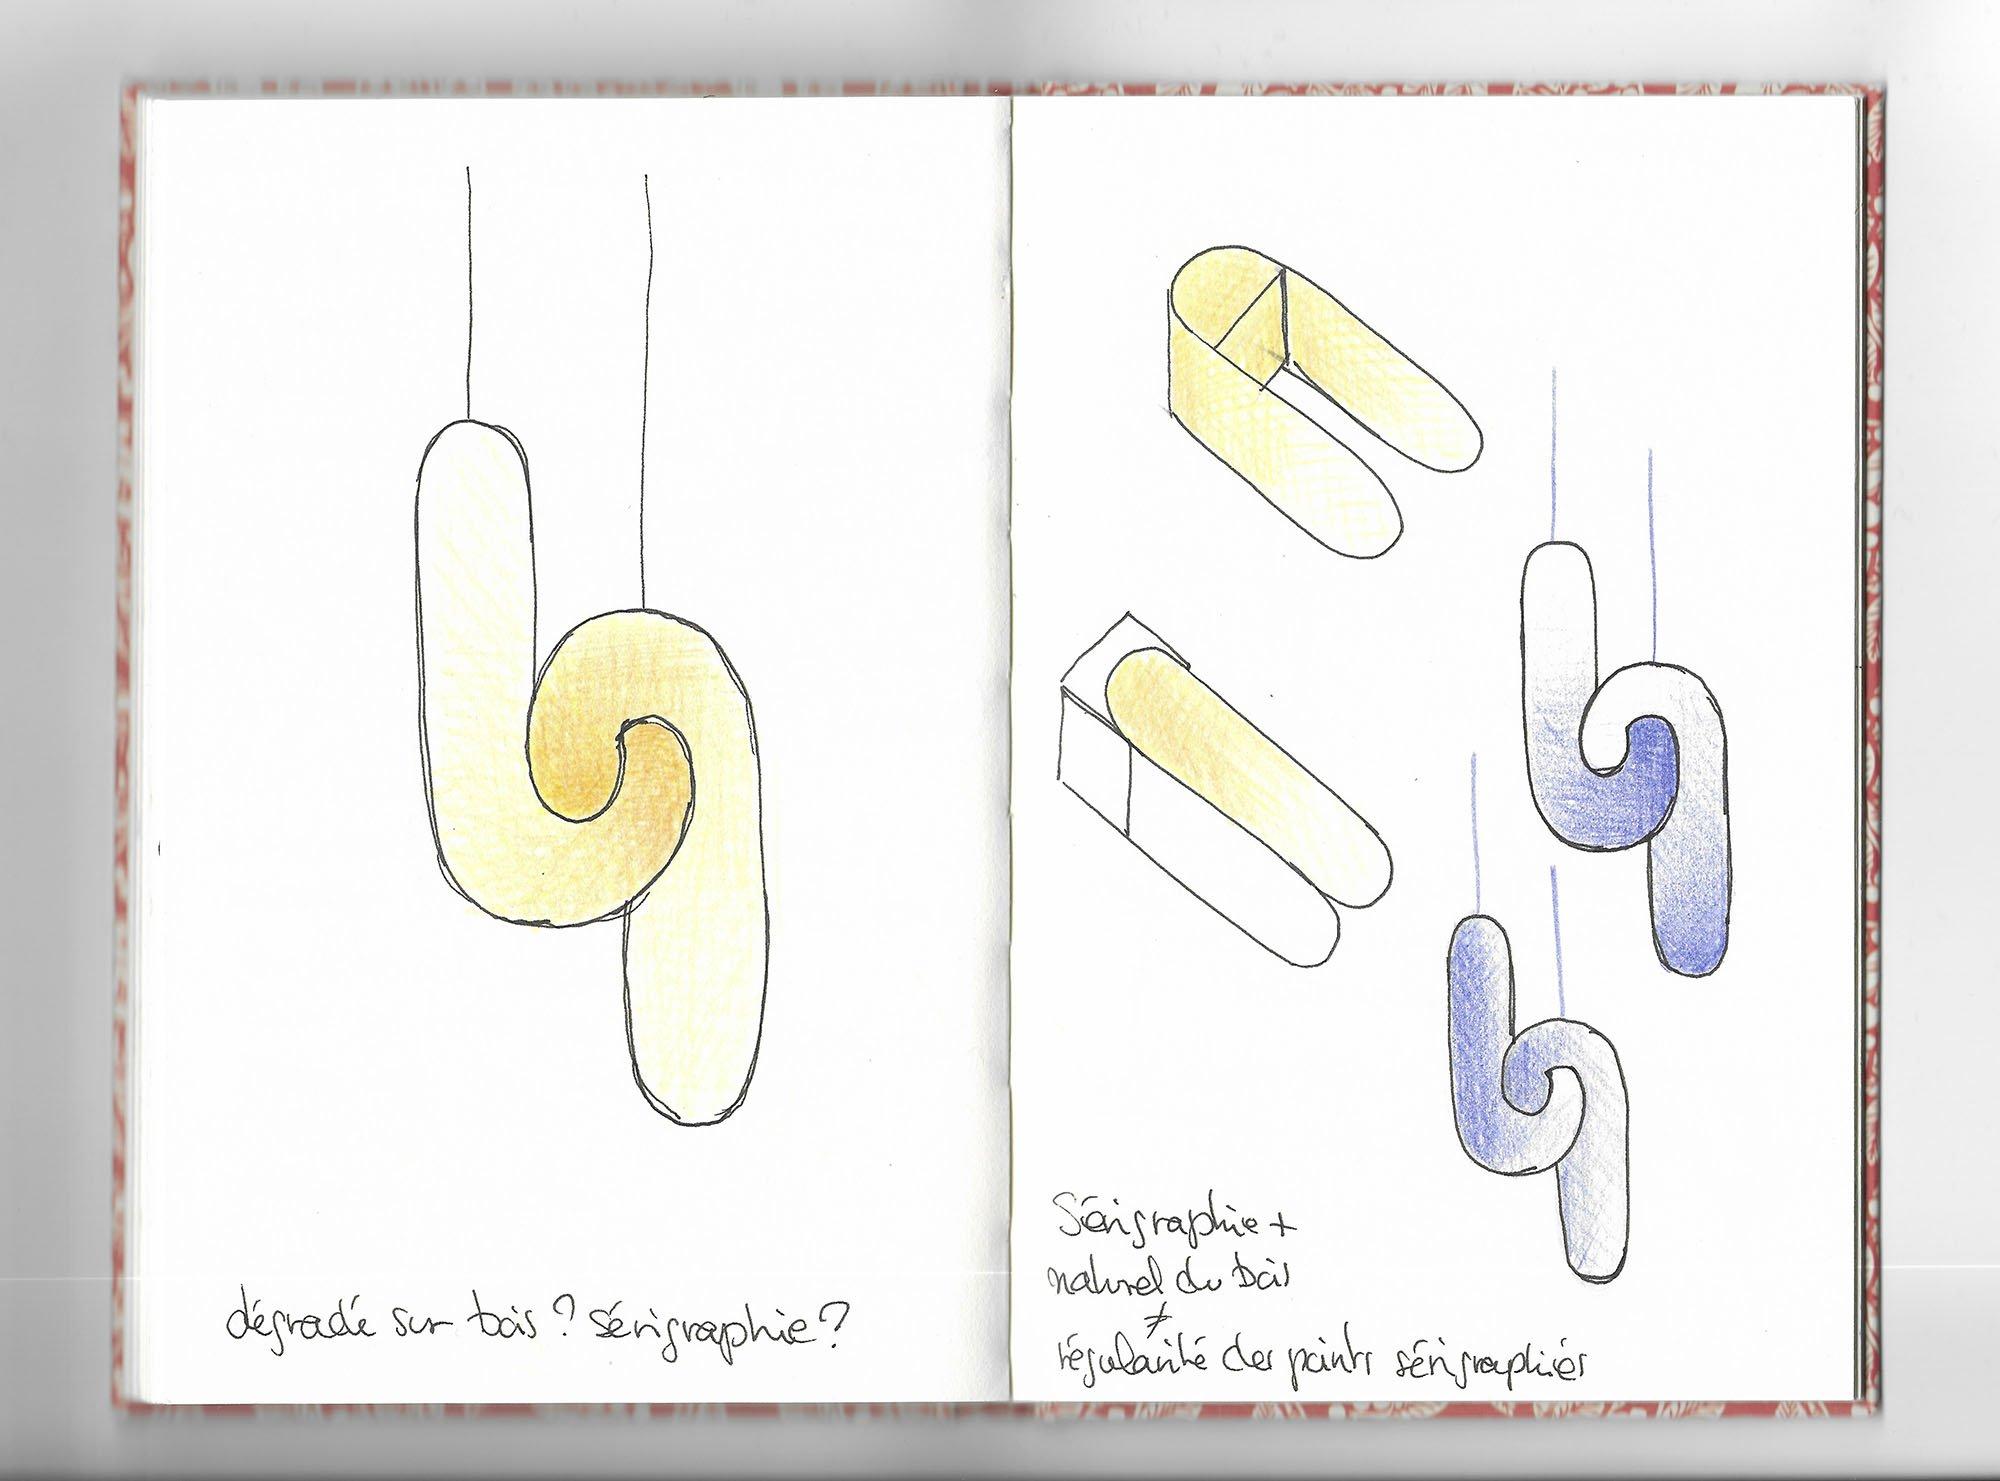 Isabelle Baudraz_3 Presences_Prototyping 2